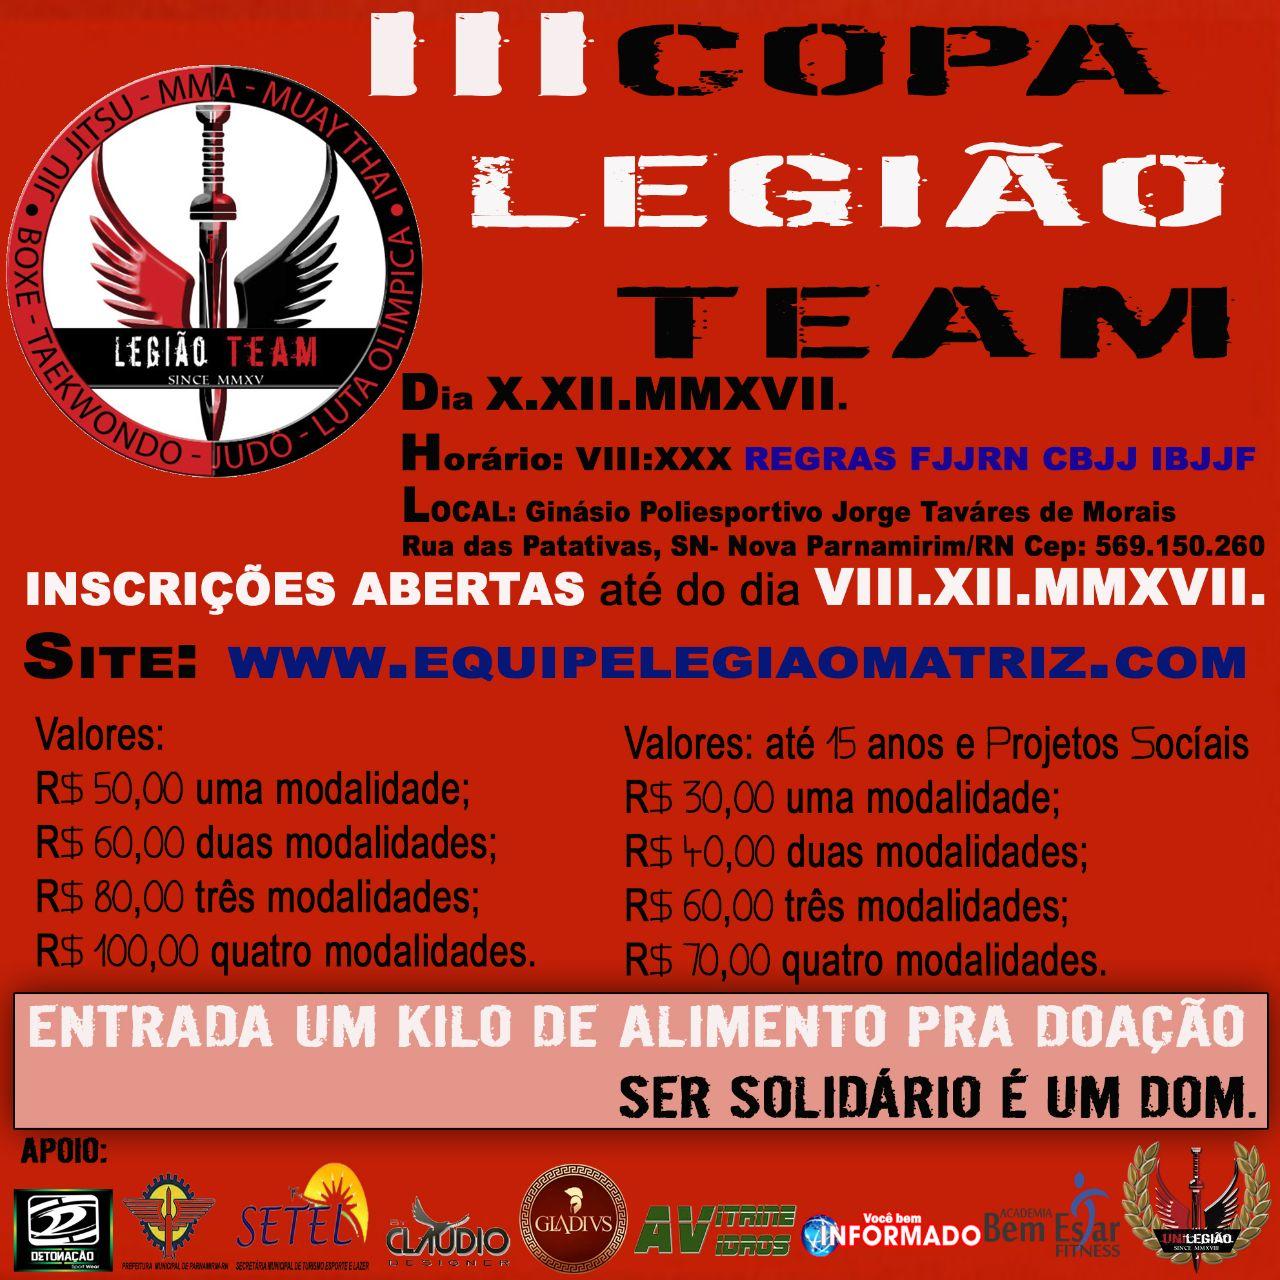 III COPA LEGIÃO TEAM